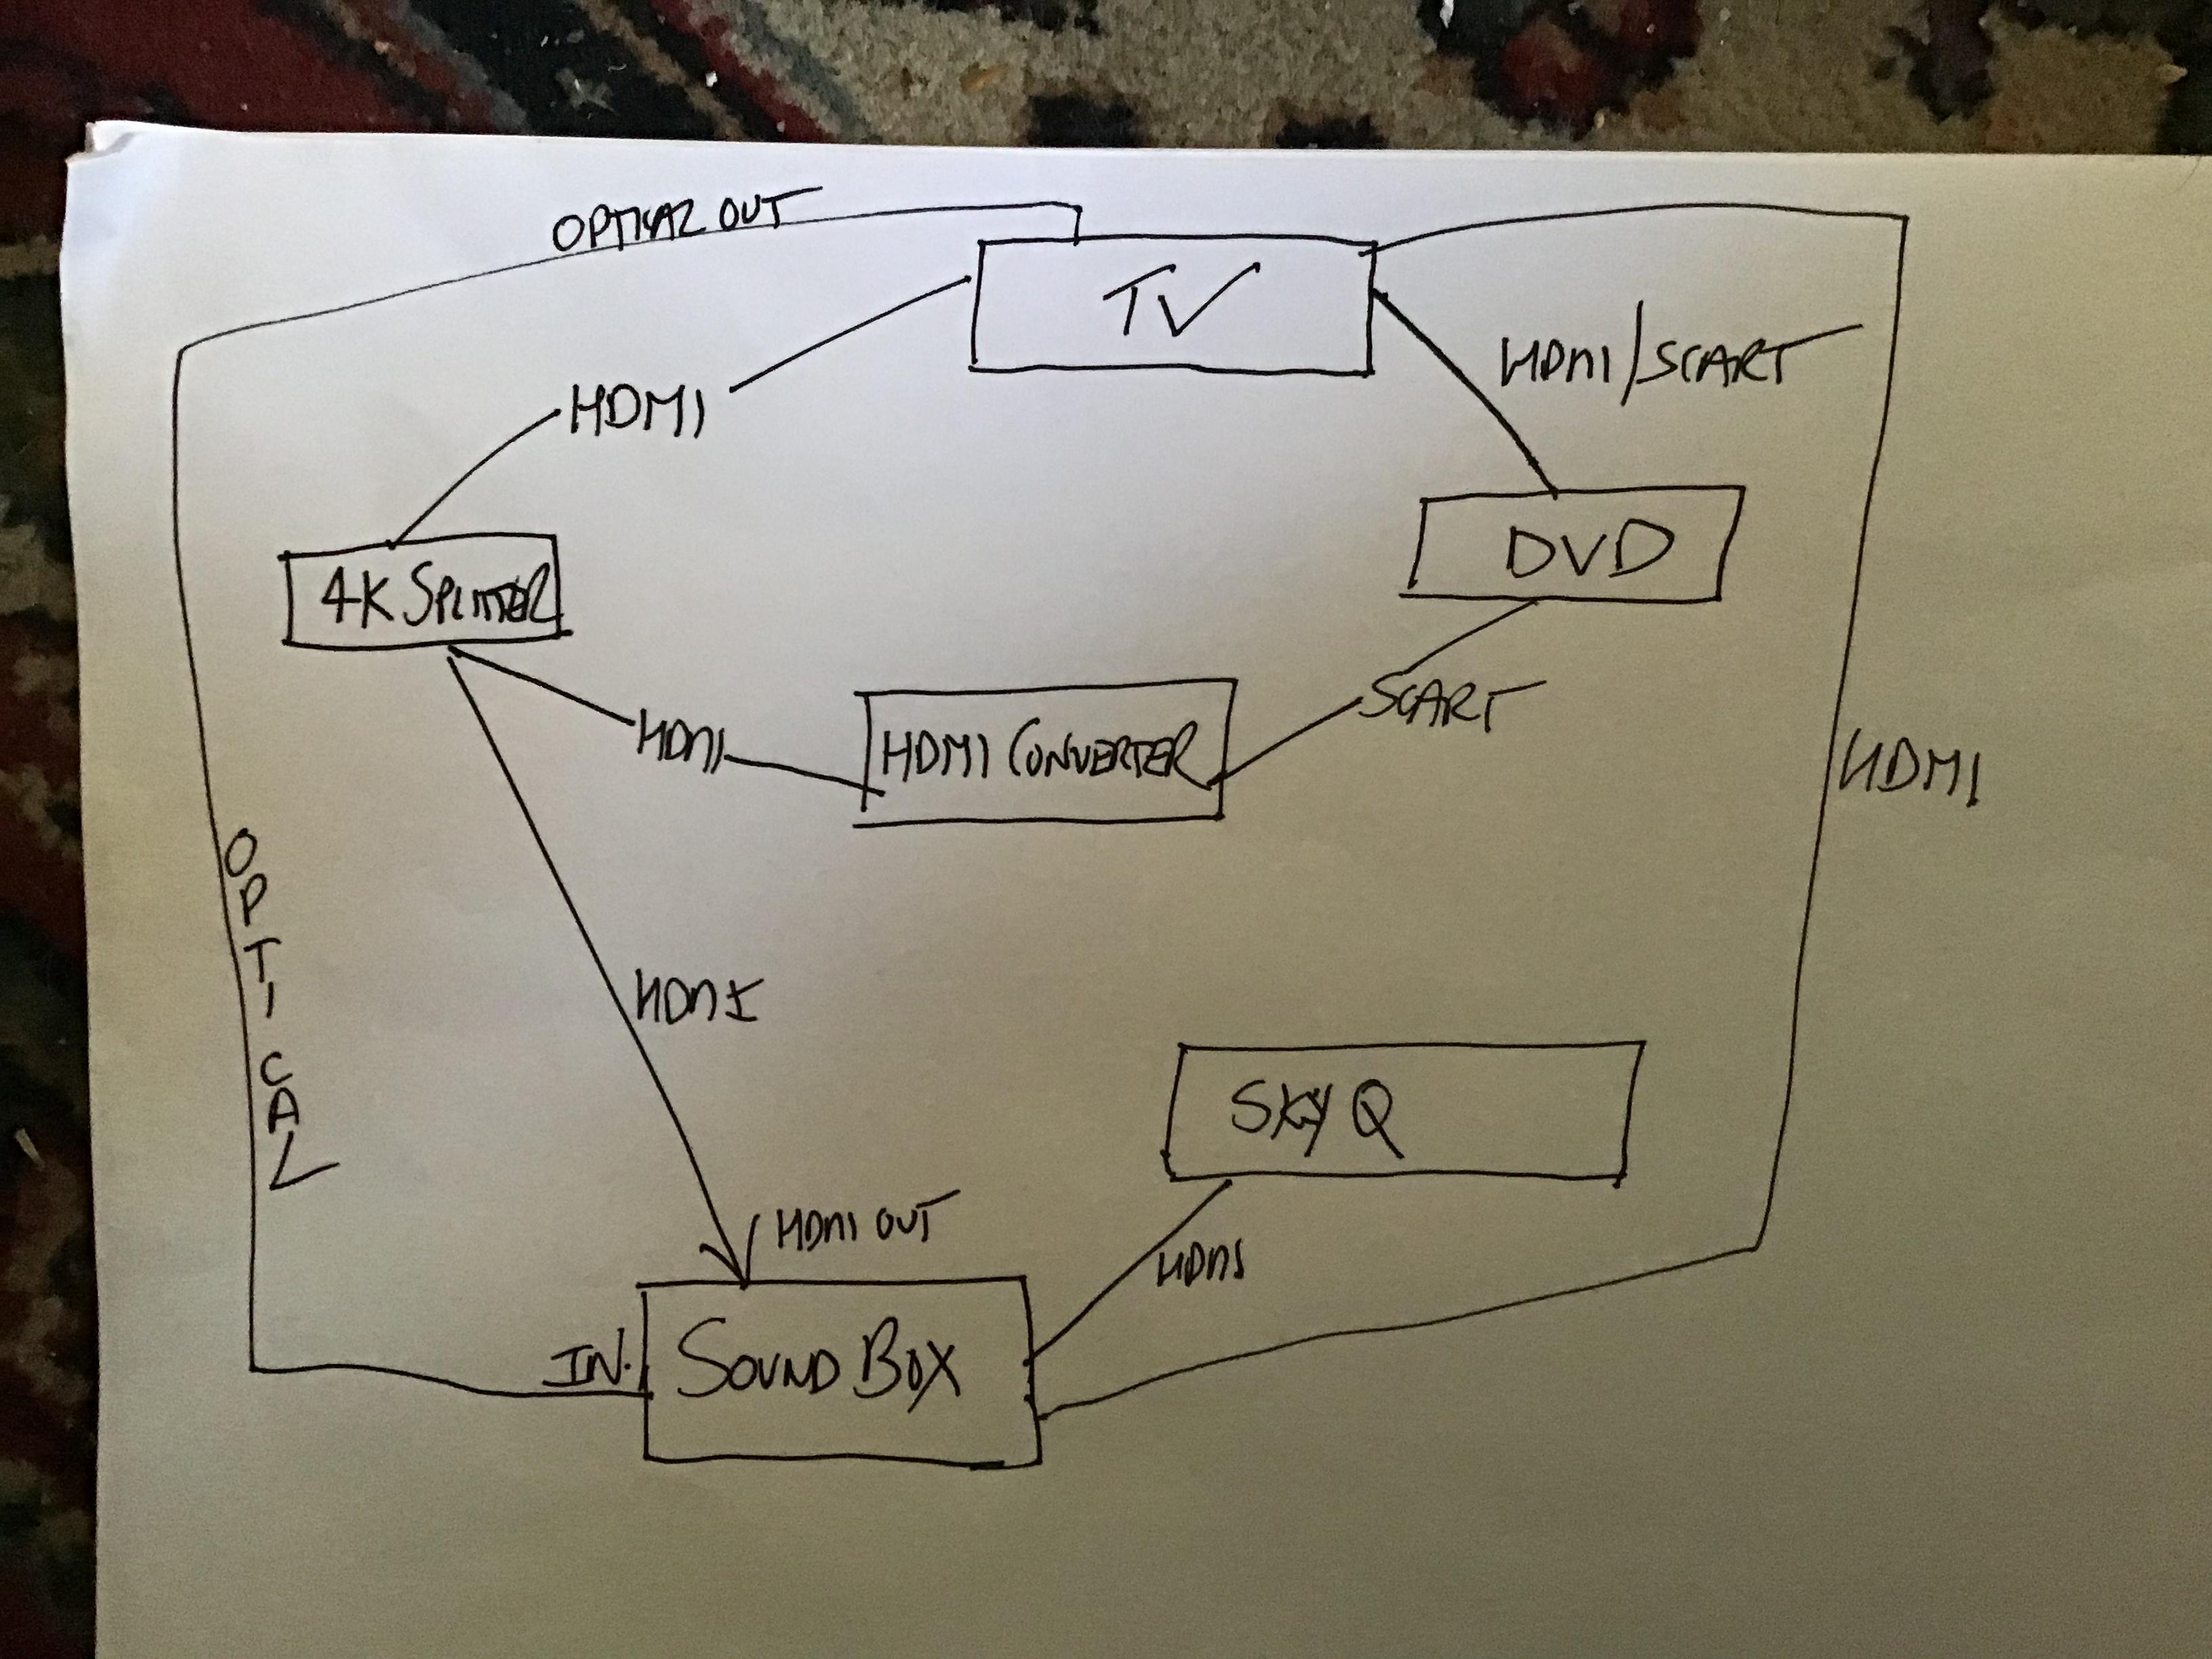 wiring diagram dvd vcr tv [ 3264 x 2448 Pixel ]